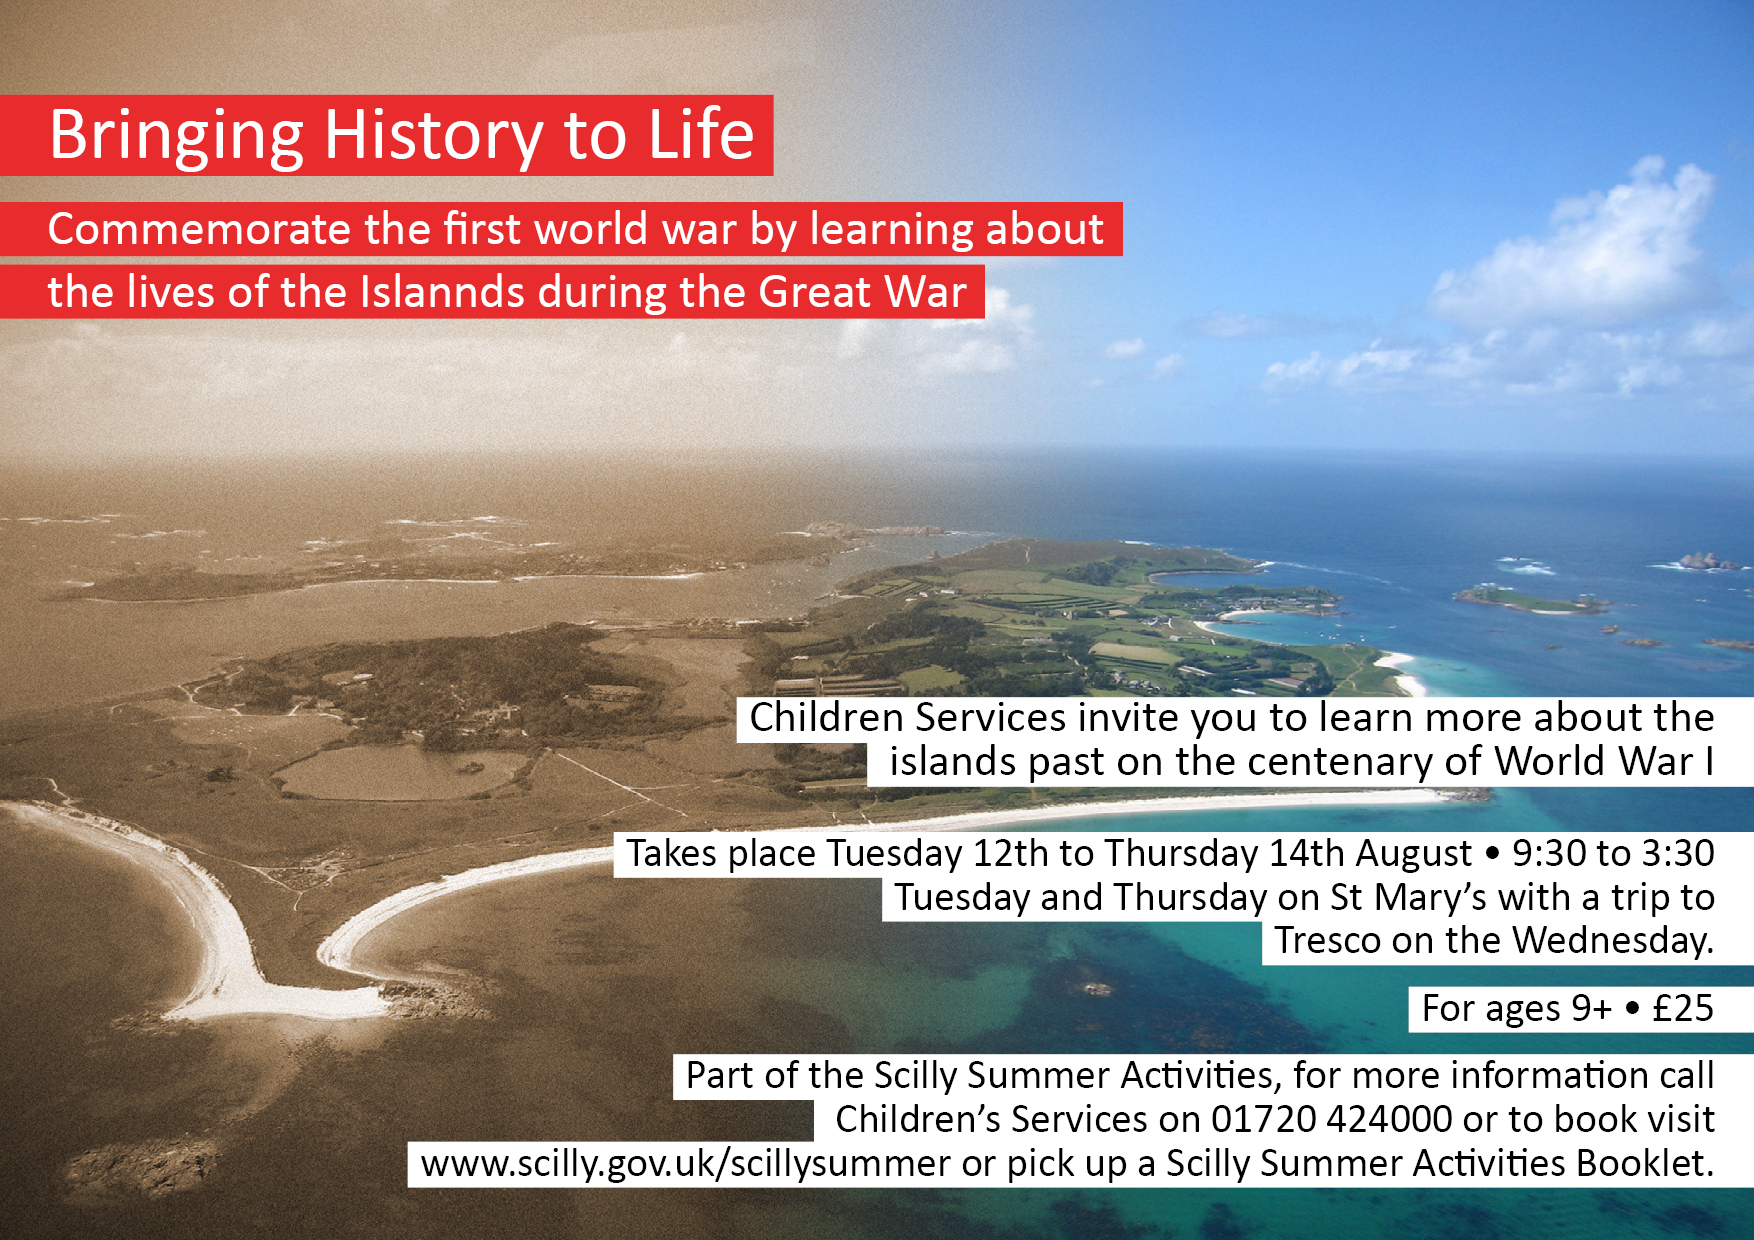 Bringing History to Life Poster